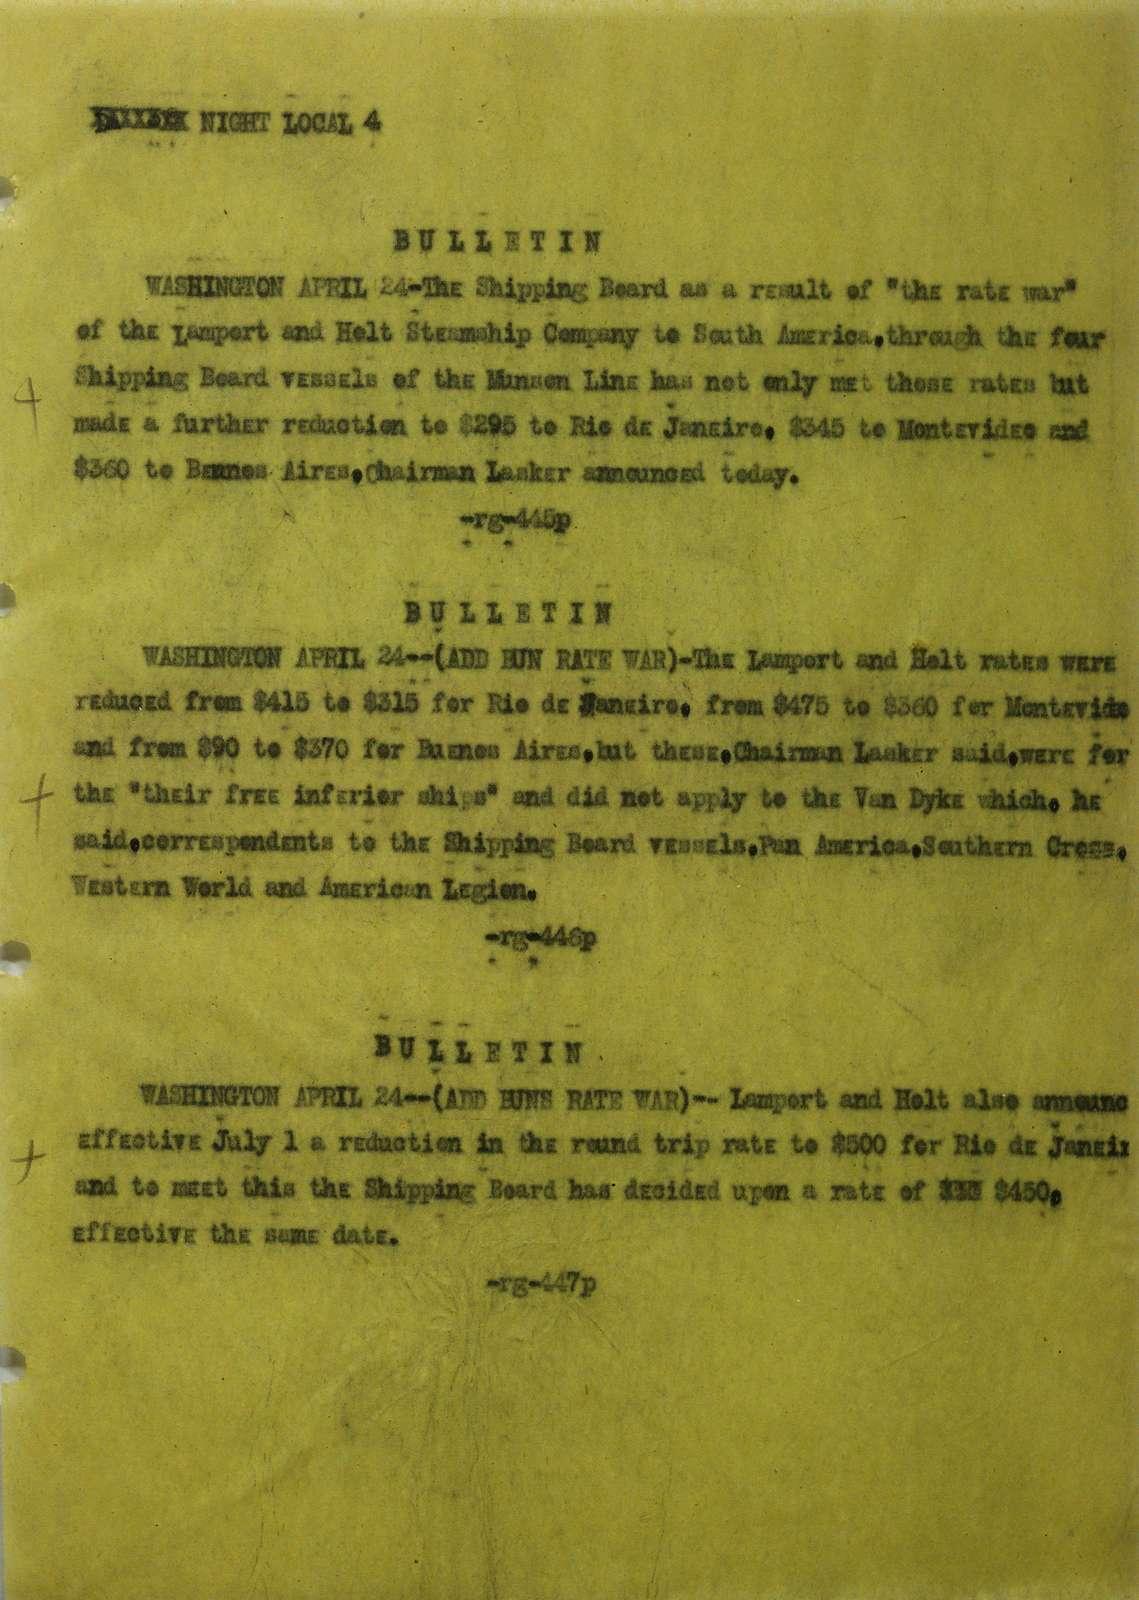 Associated Press, Washington, D.C., Bureau News Dispatches: 1922, Apr. 16-30